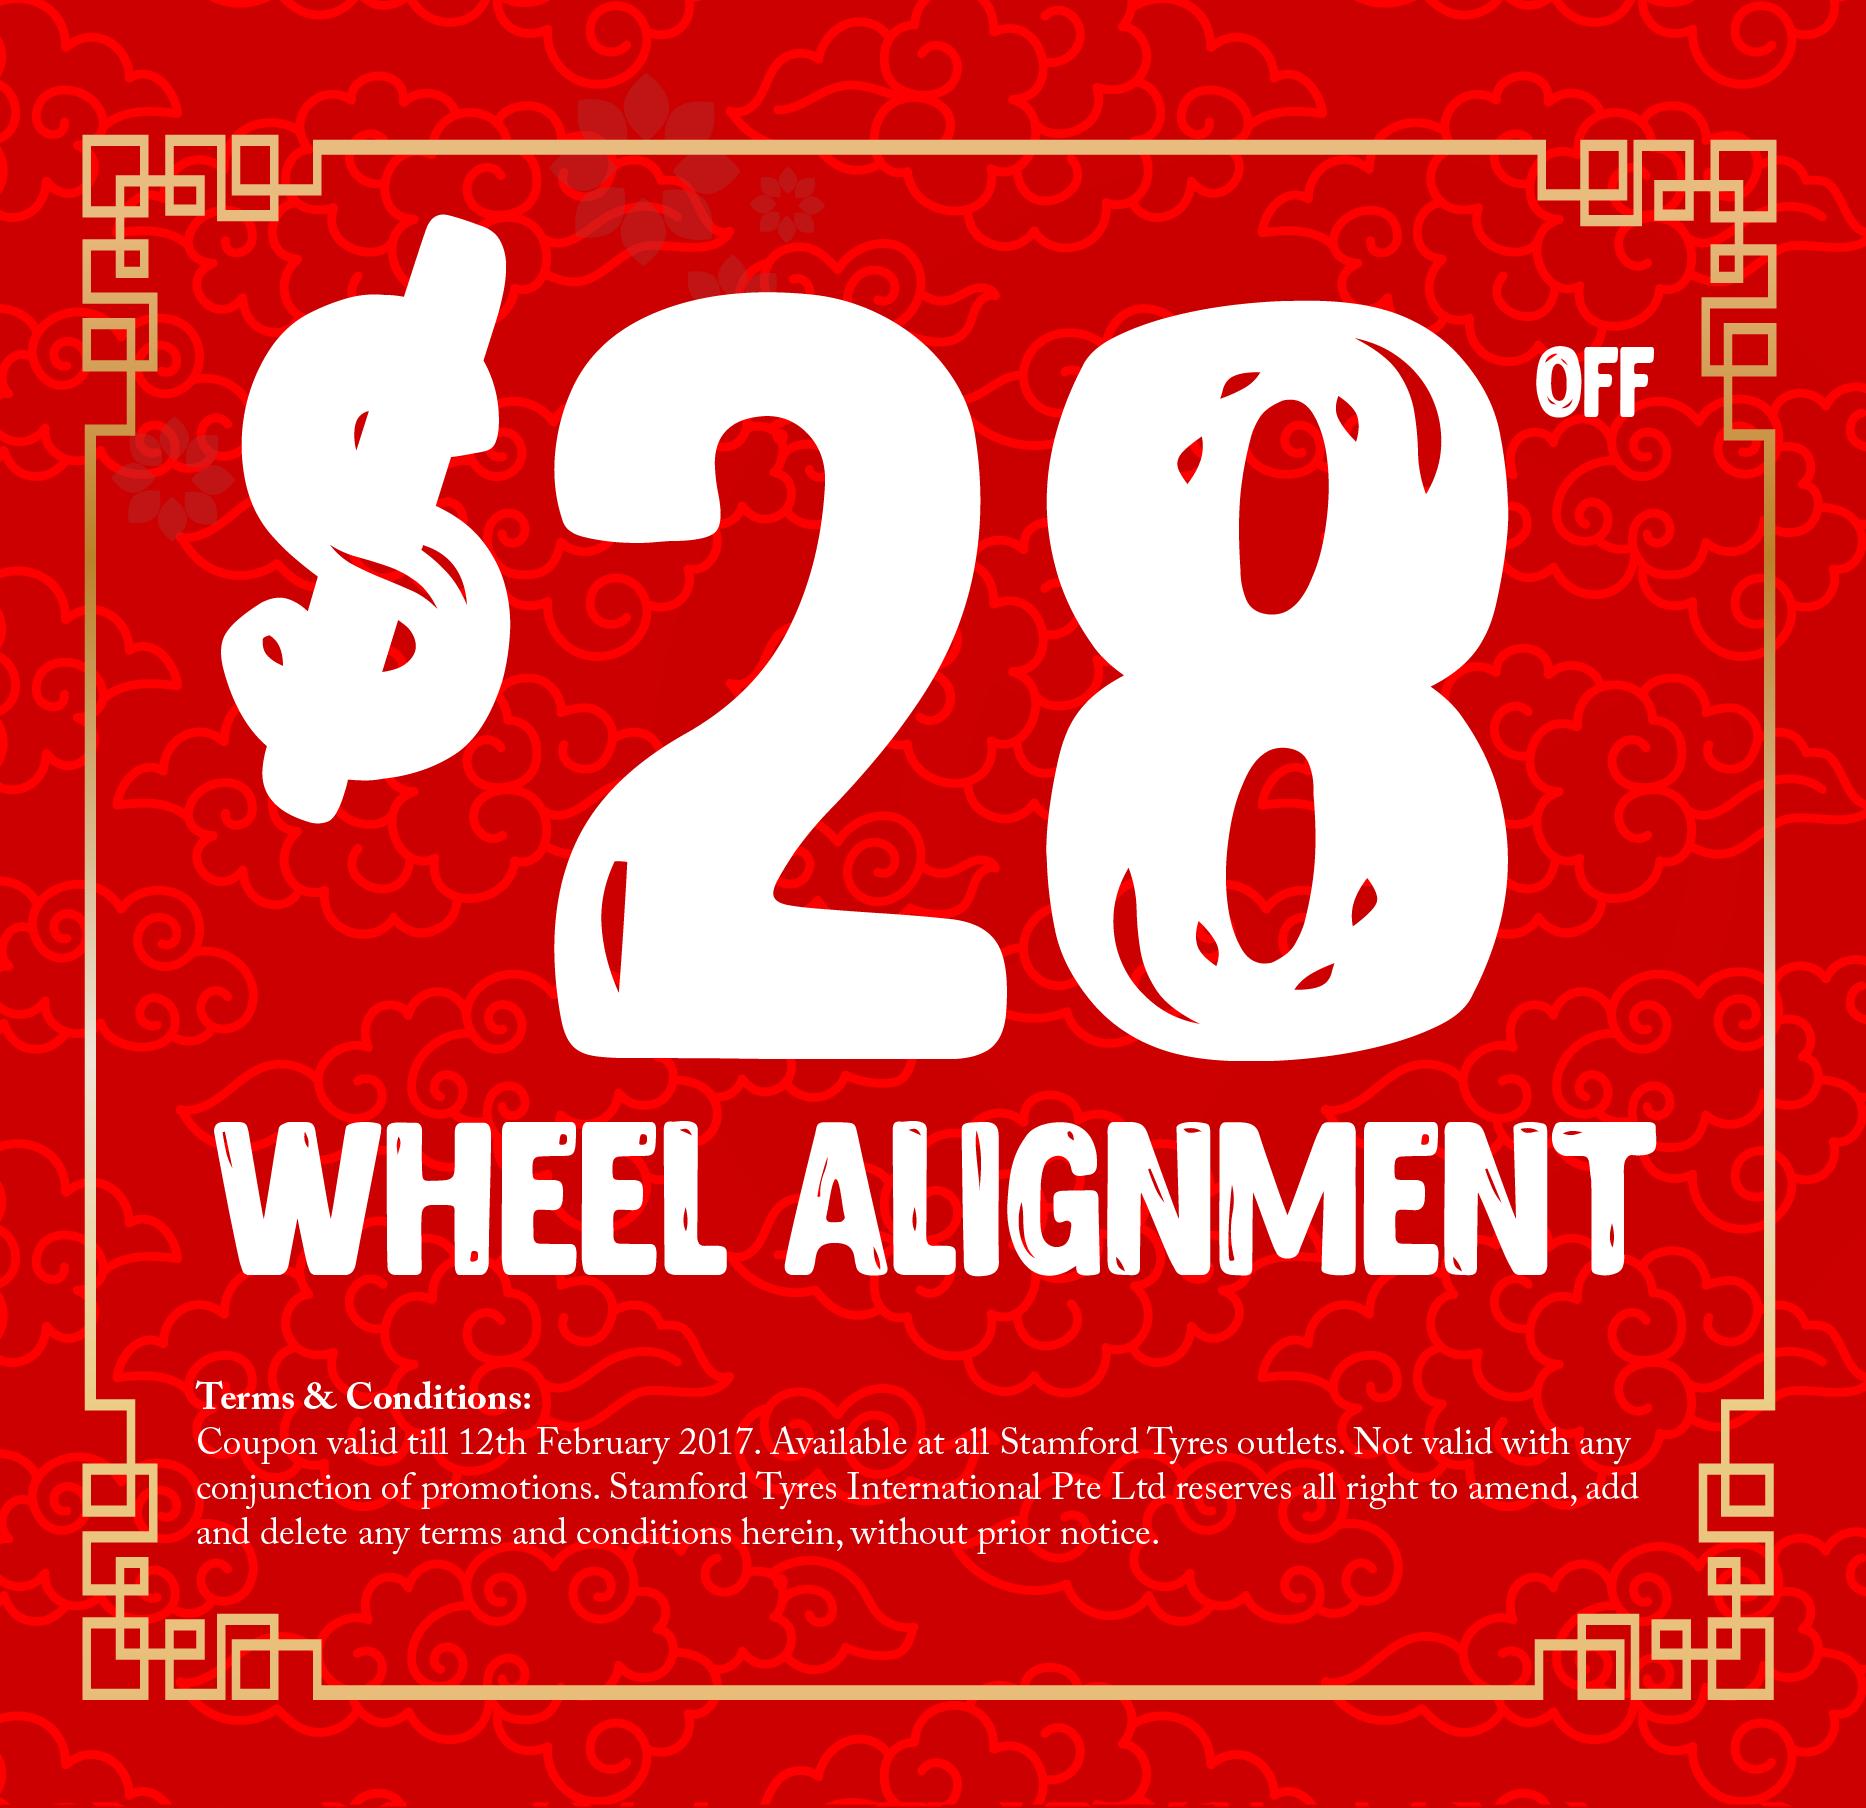 fb-wheel-alignment-01